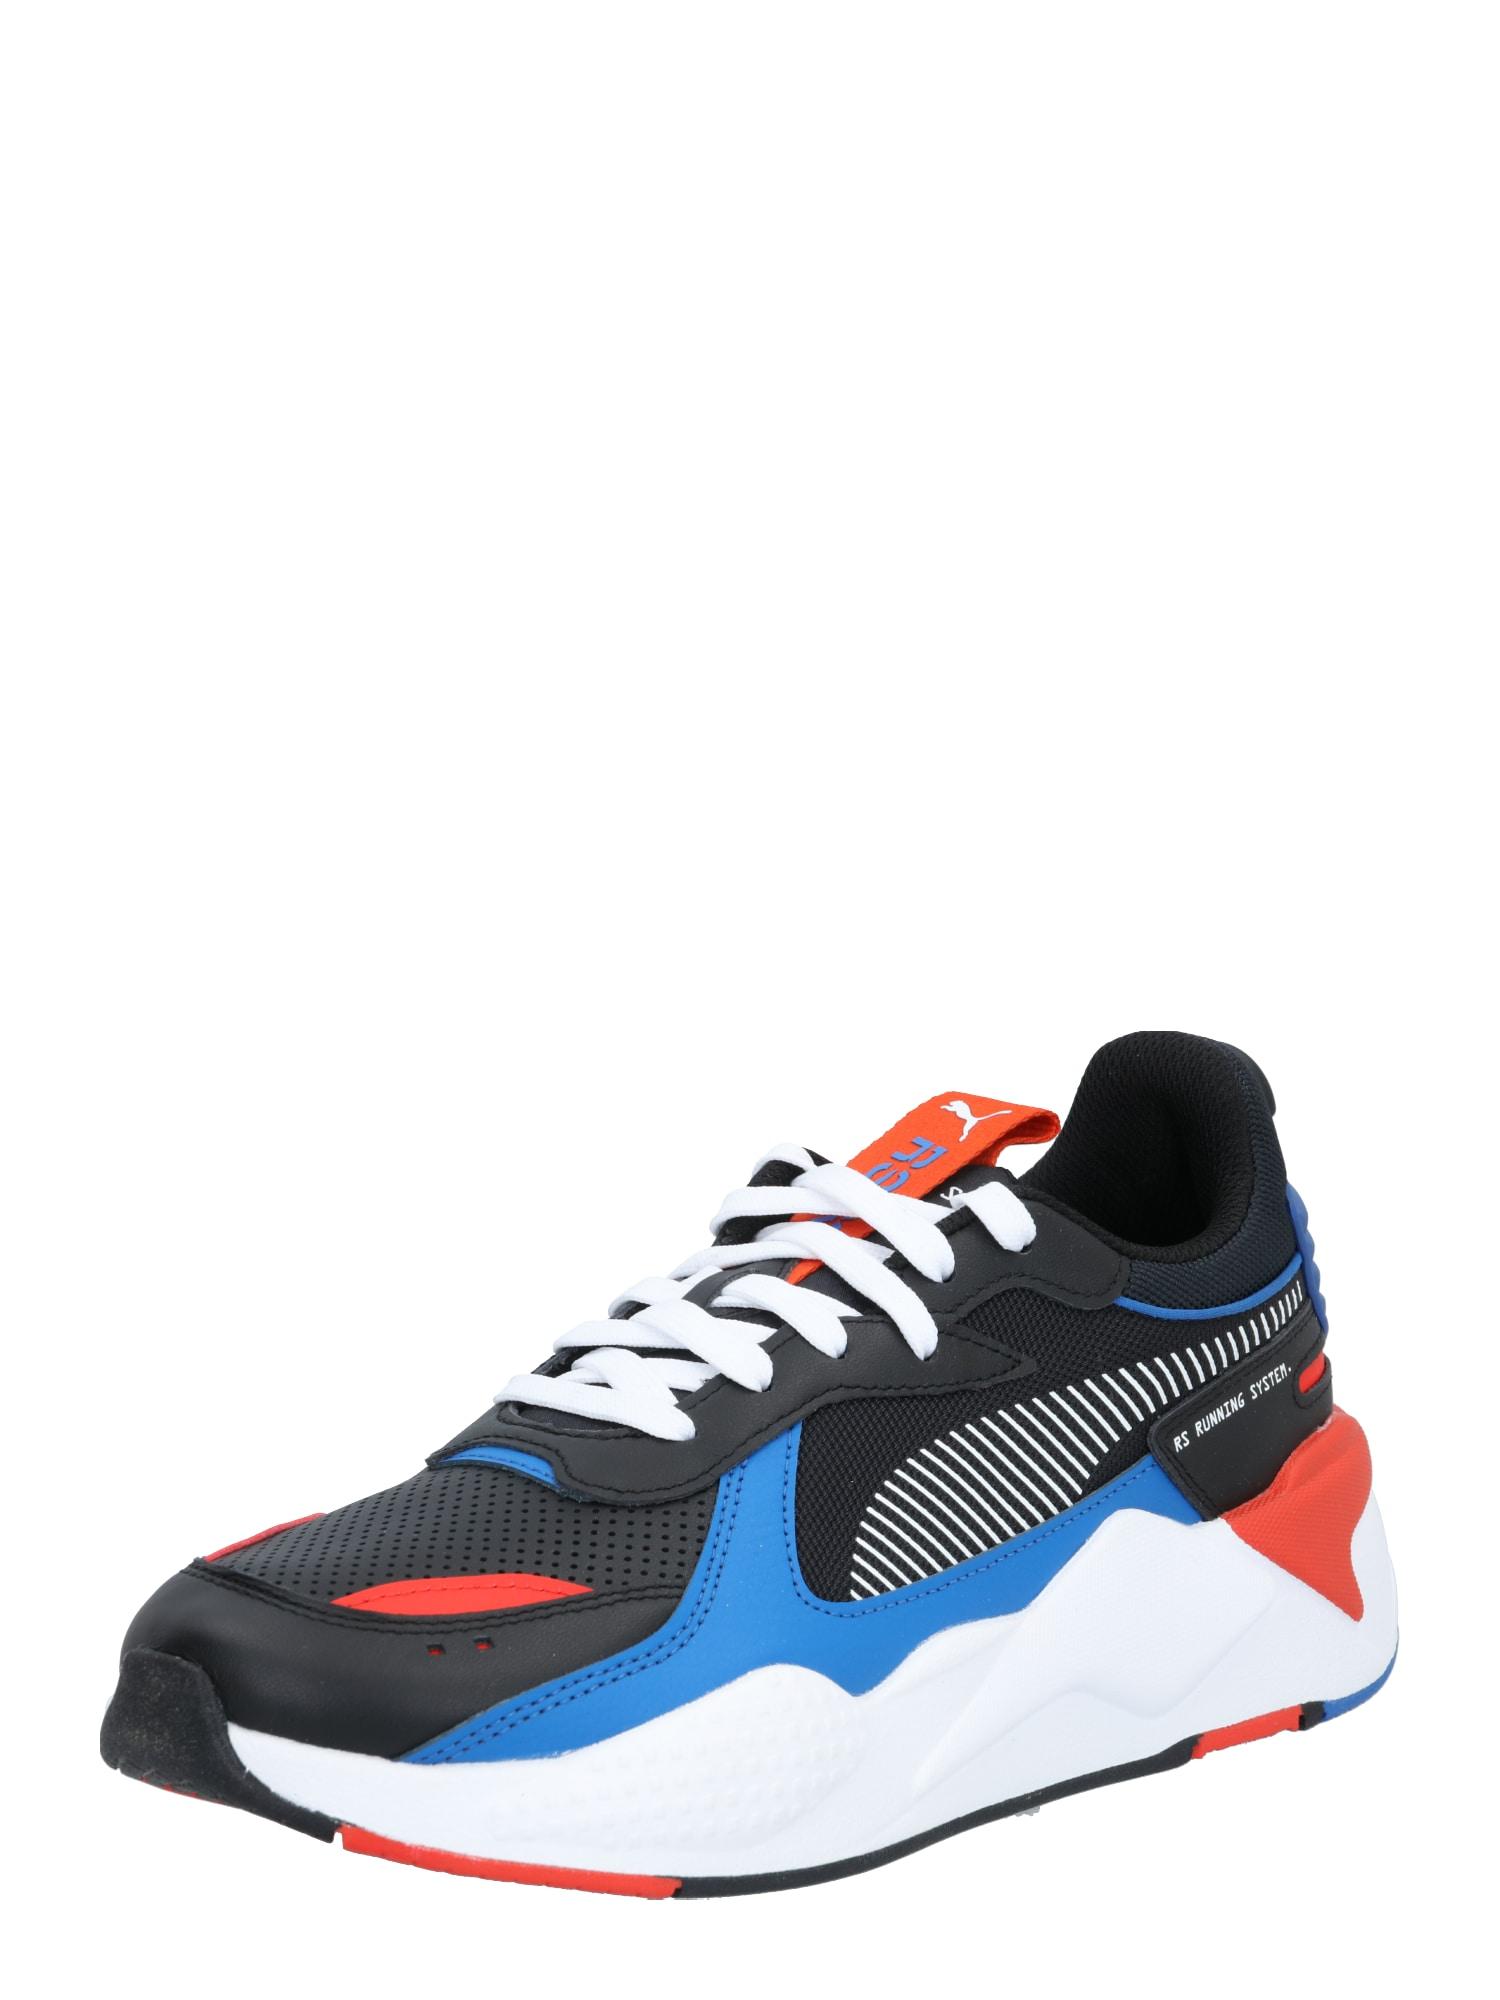 PUMA Tenisky 'WINTERIZED'  červená / černá / modrá / bílá